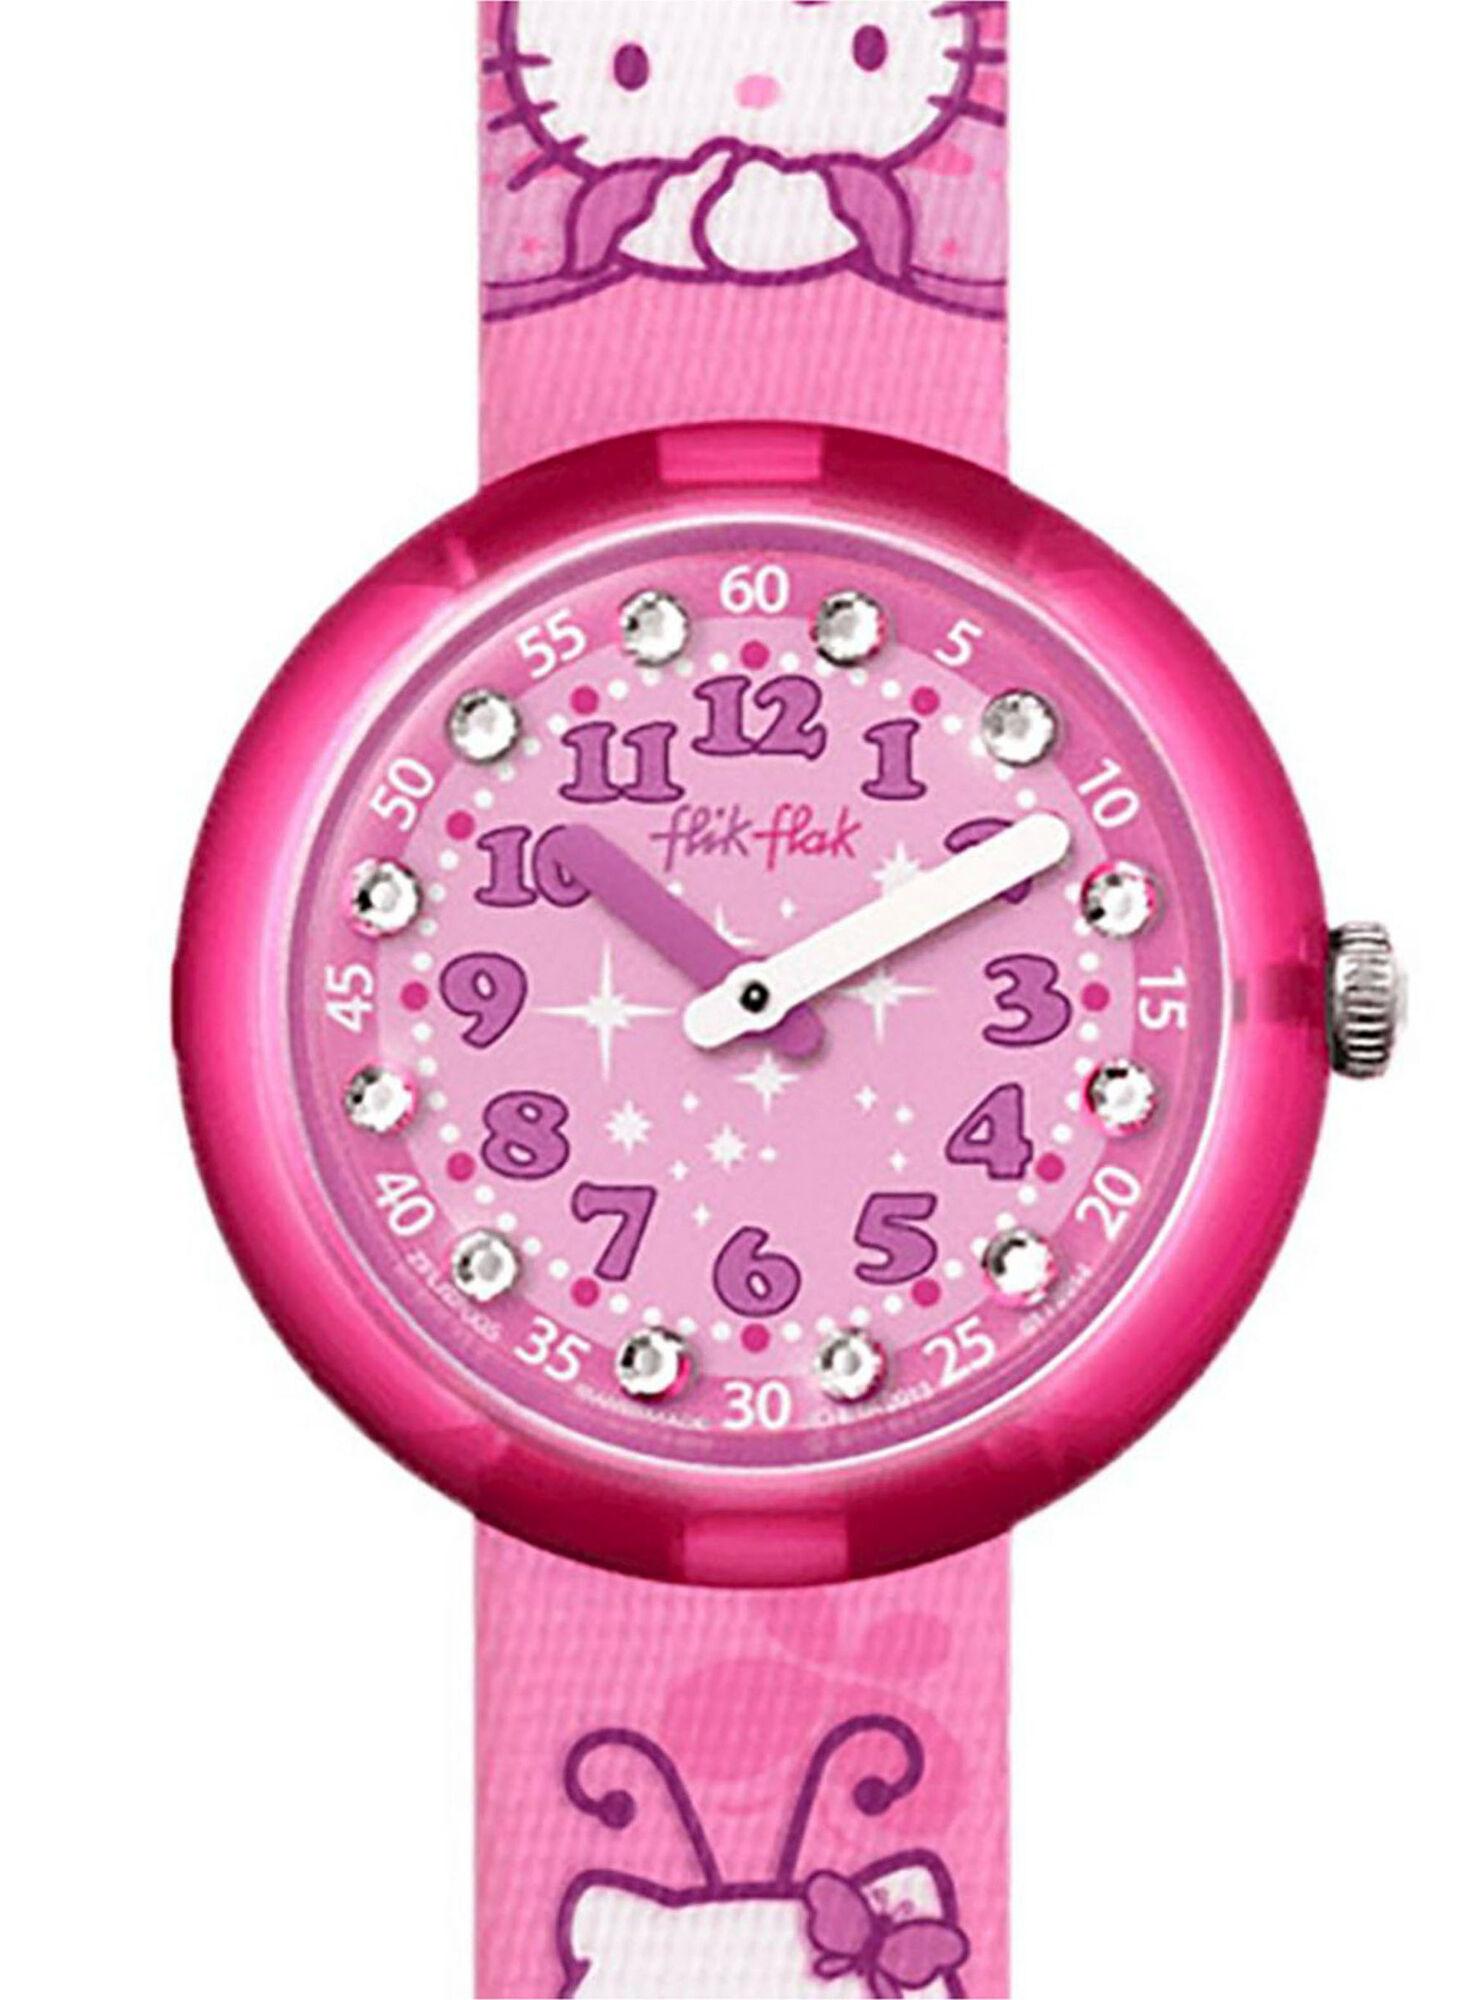 0a4ddd64378e Reloj Análogo Flik Flak Hello Kitty Mujer en Relojes